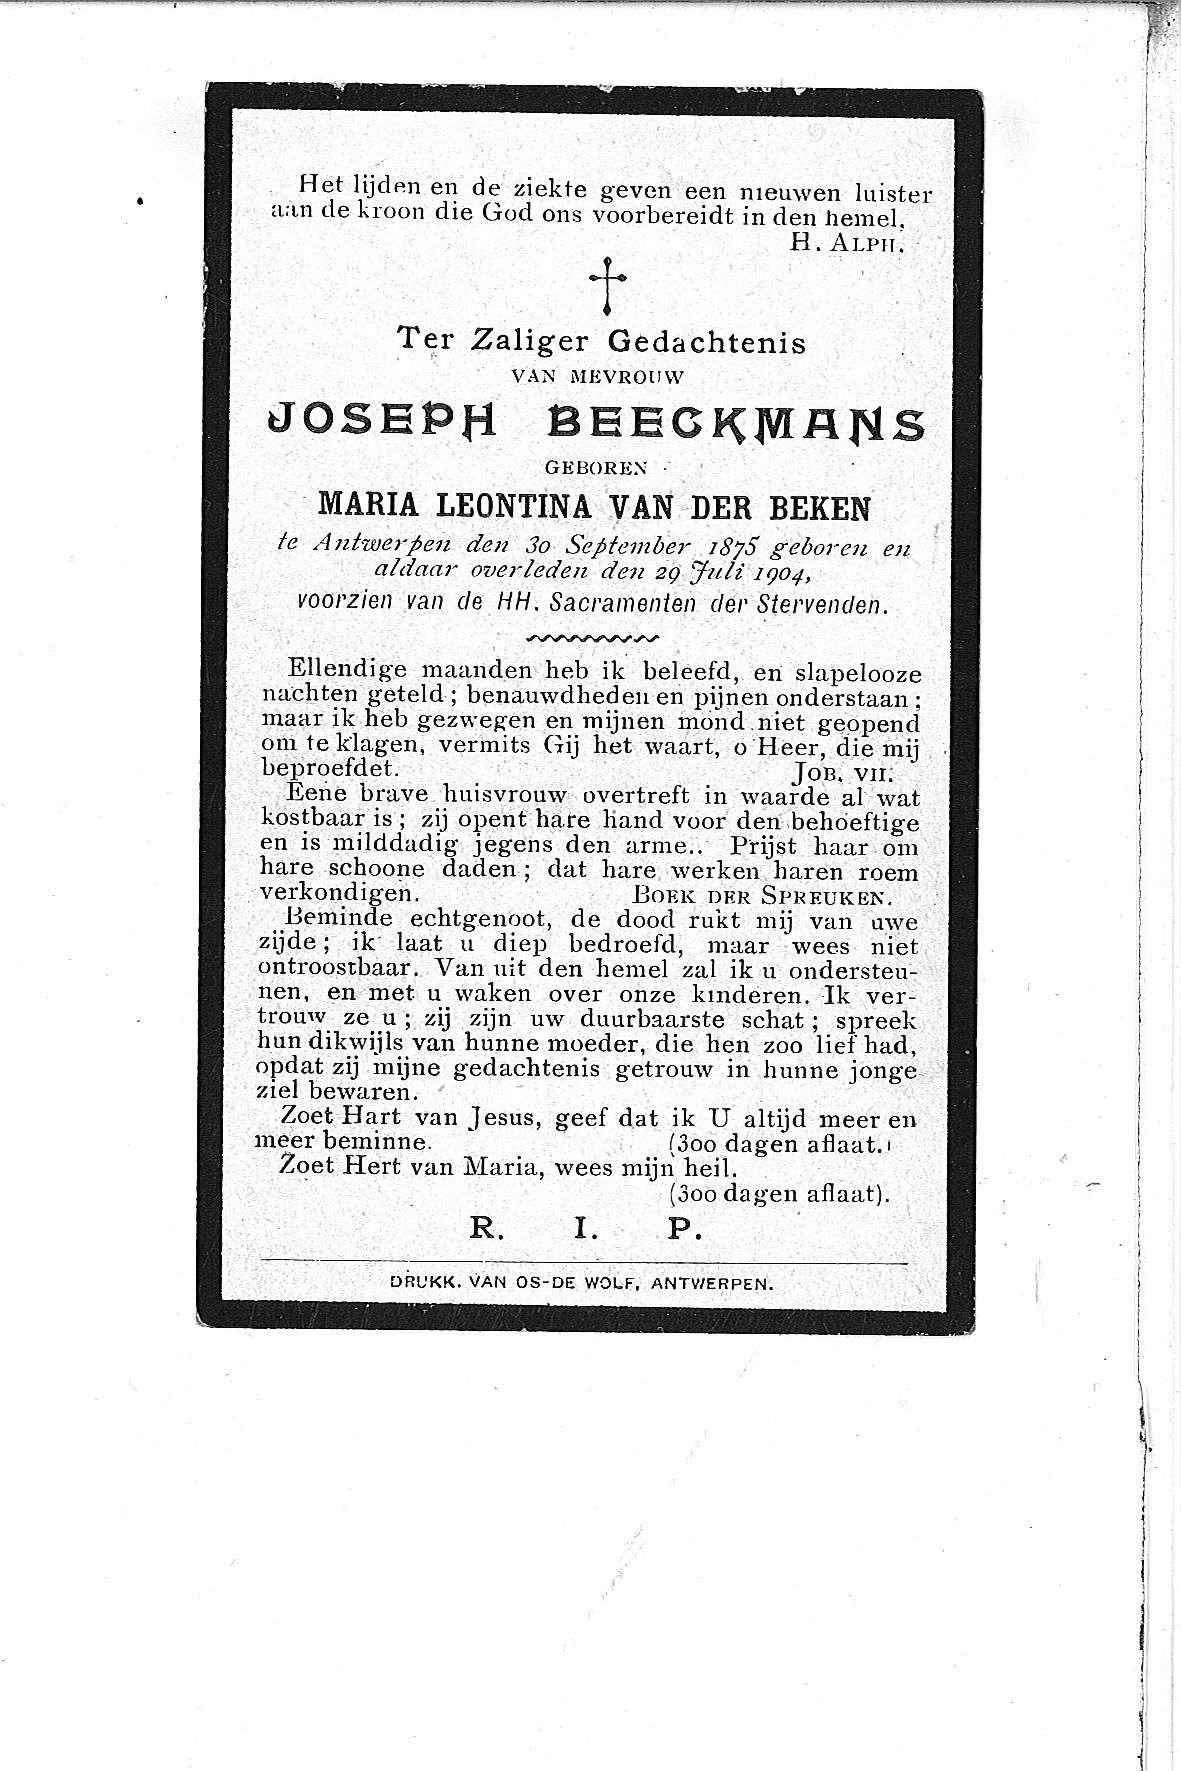 Joseph(1904)20101126153536_00001.jpg